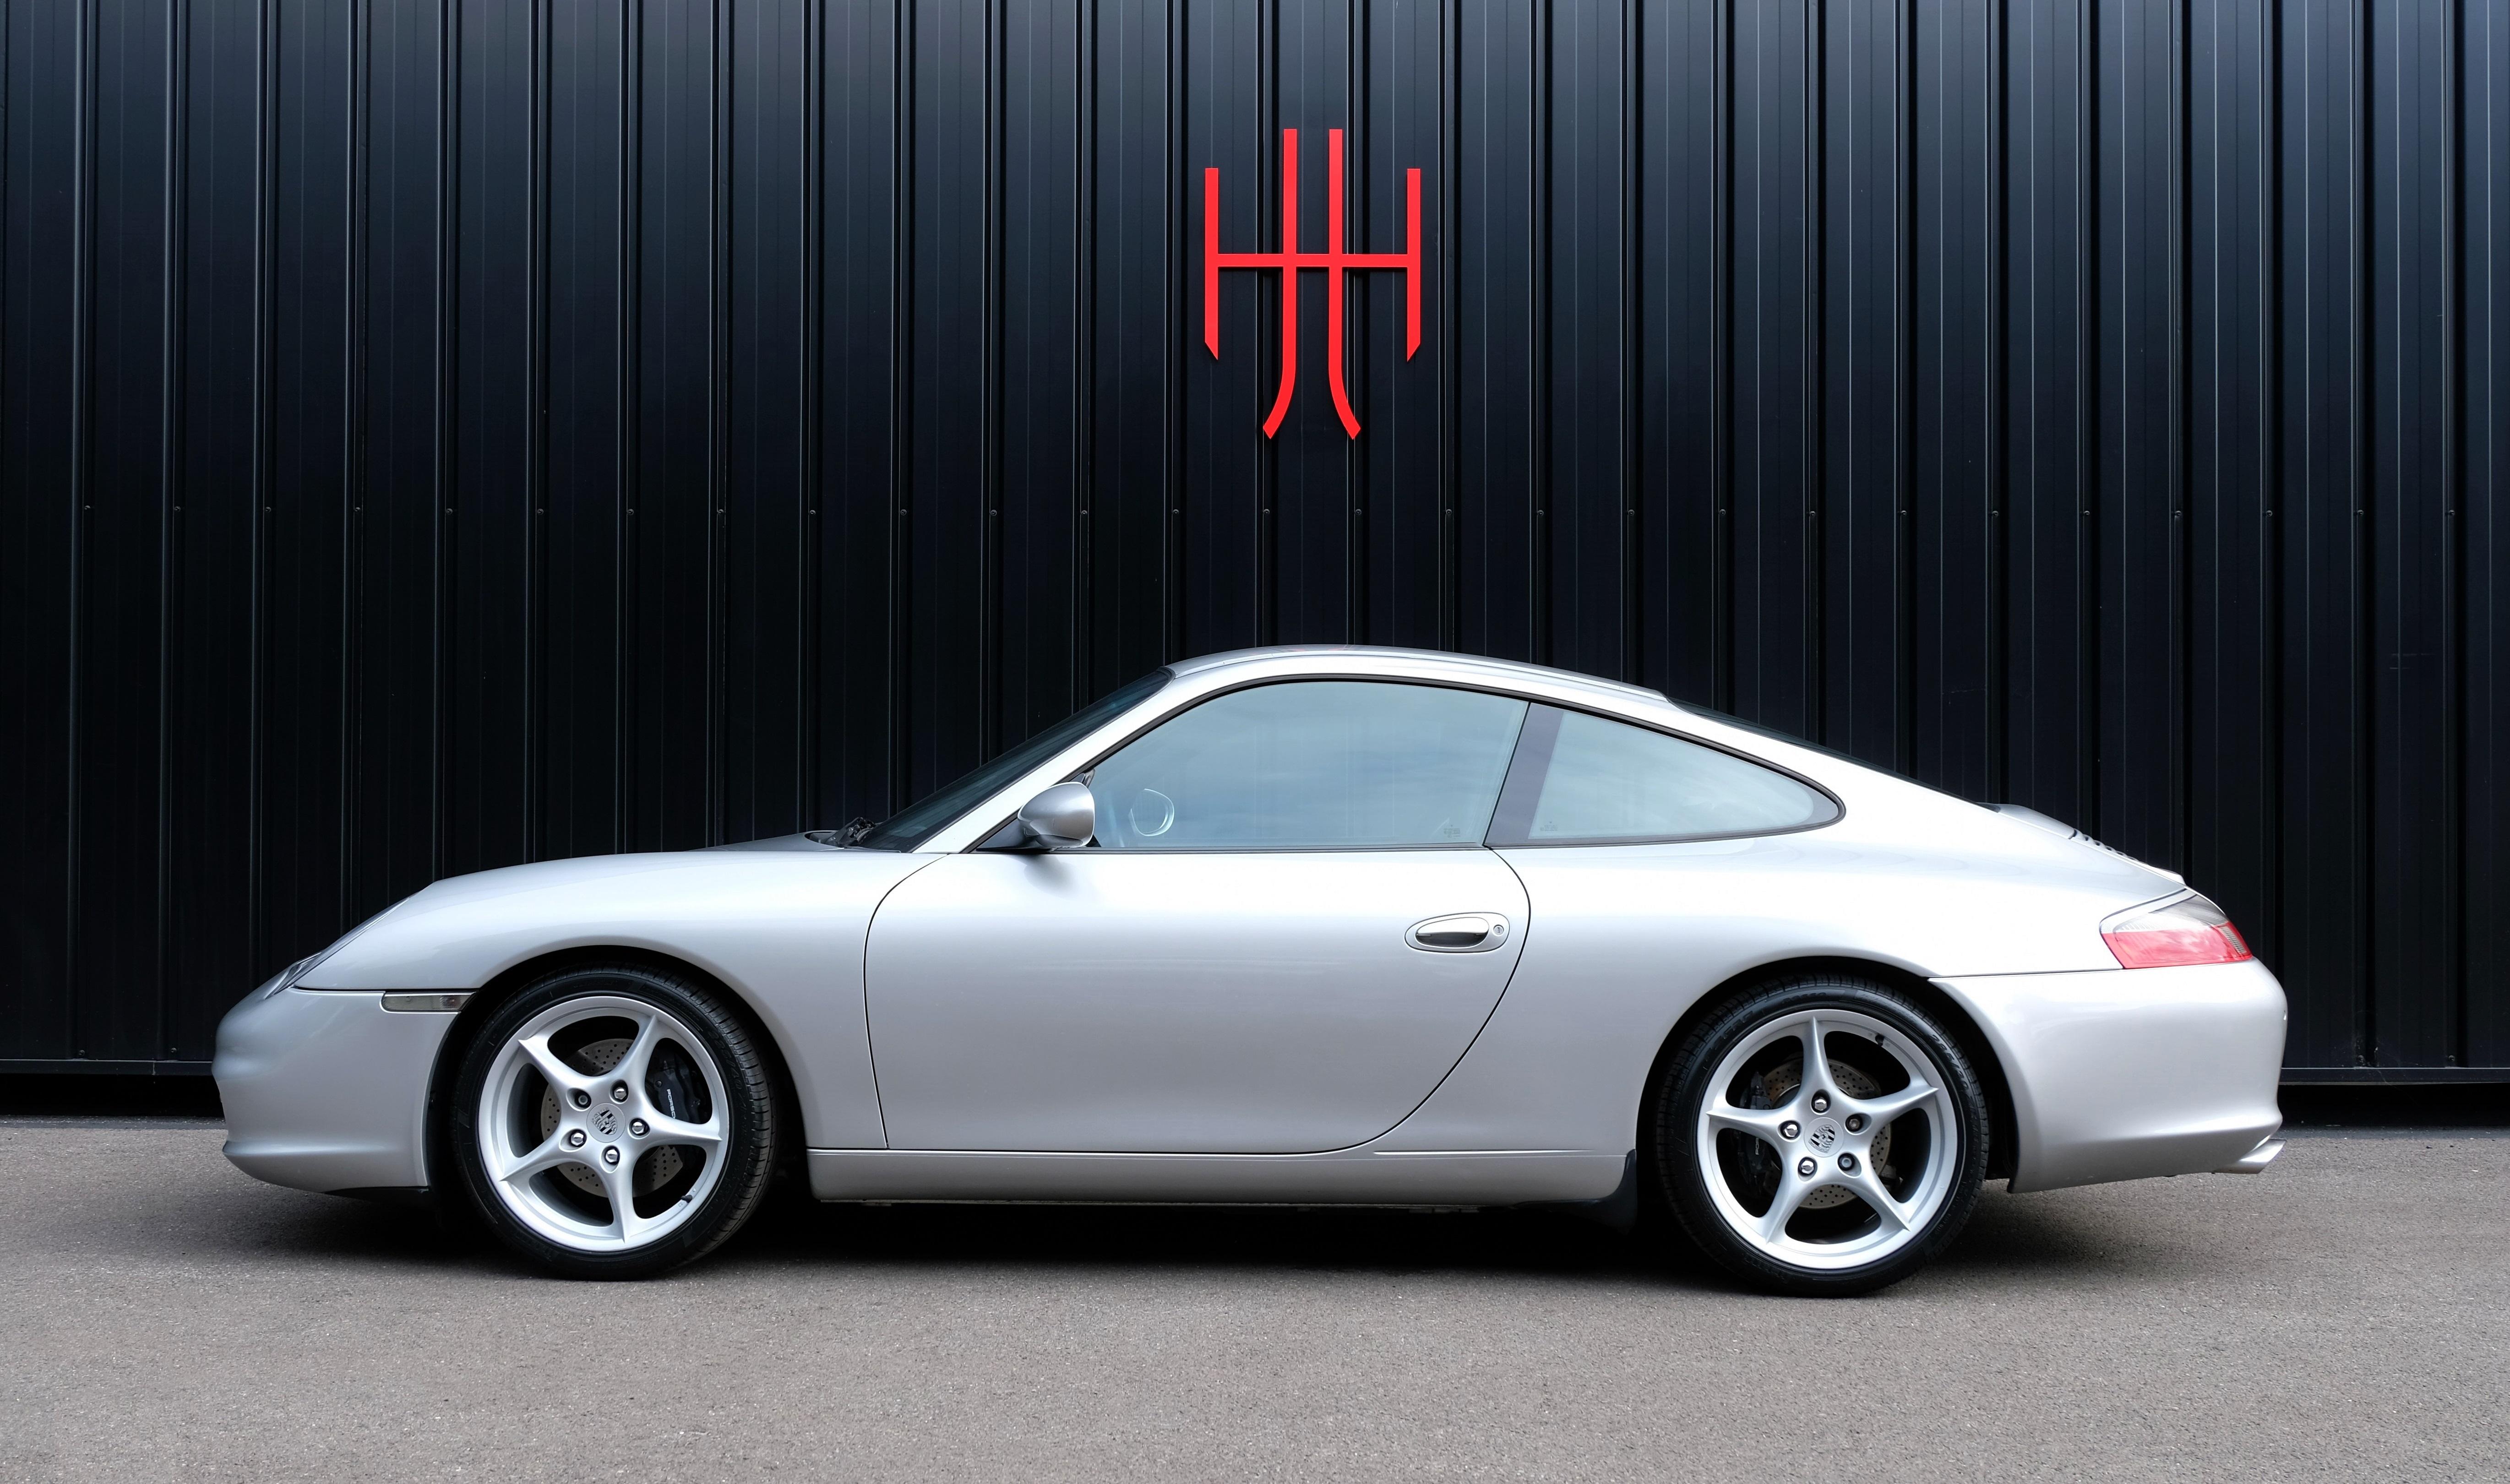 PORSCHE 911 TYPE 996 CARRERA 2